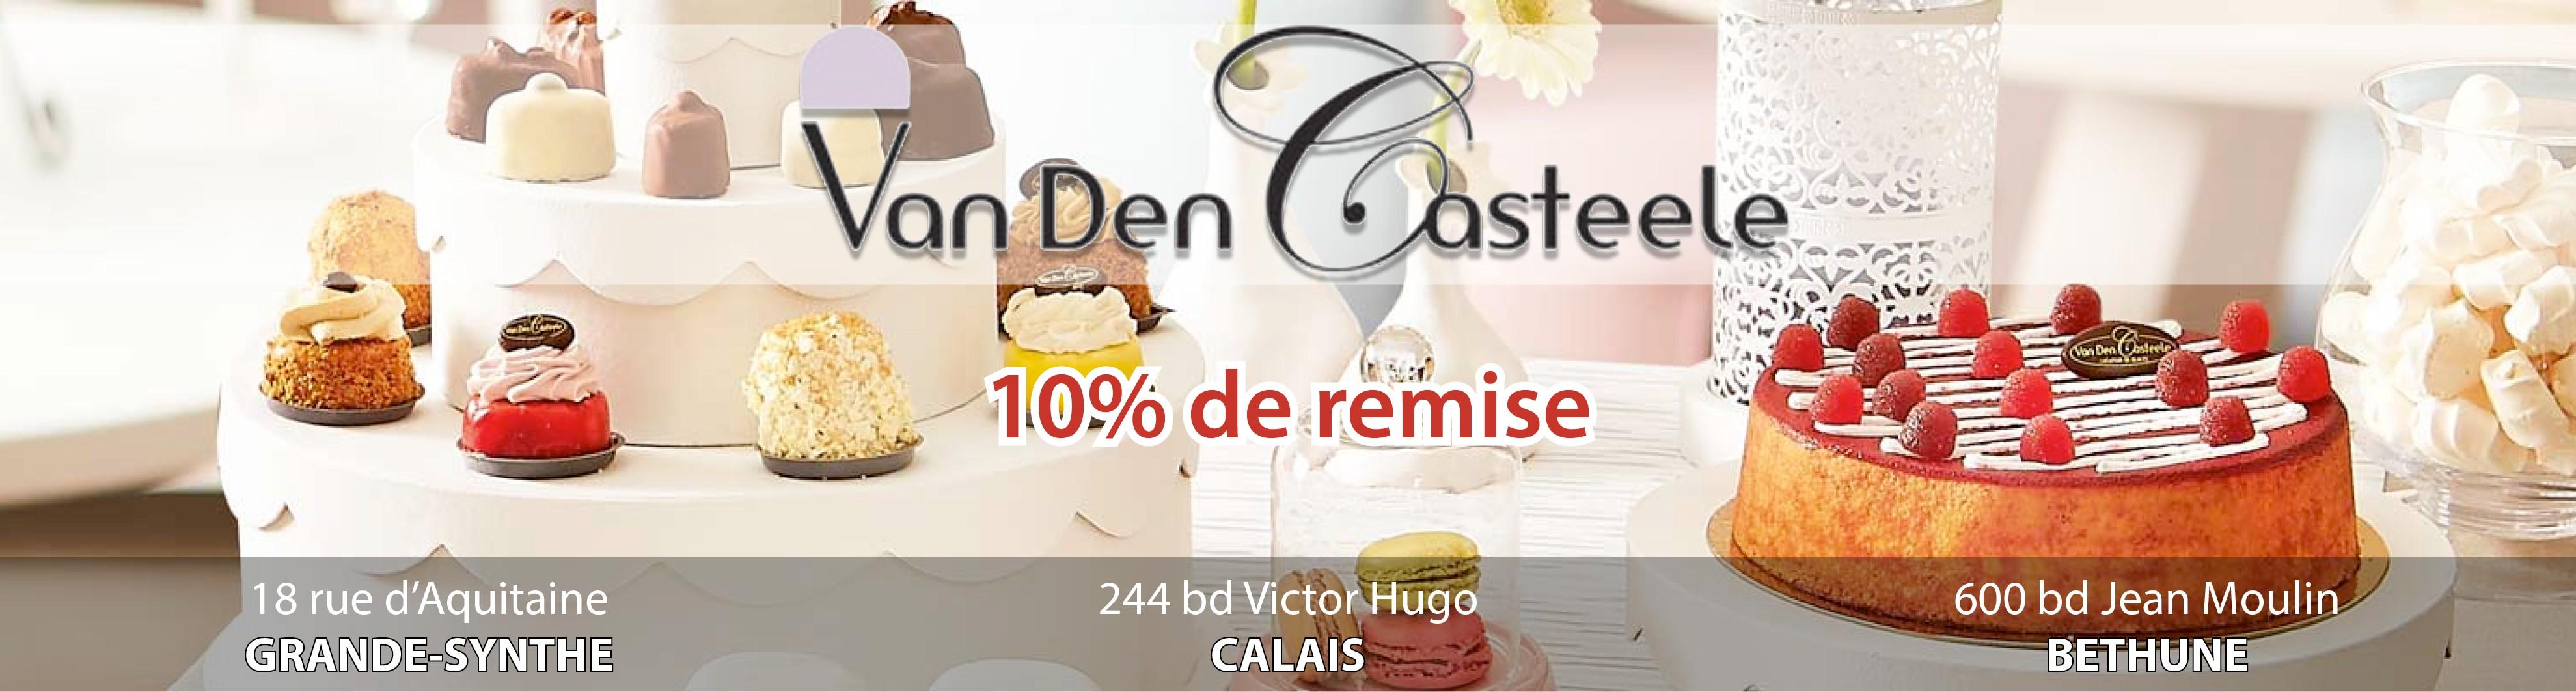 VAN DEN CASTEELE REMISE WENGEL CARTE W GLACIER